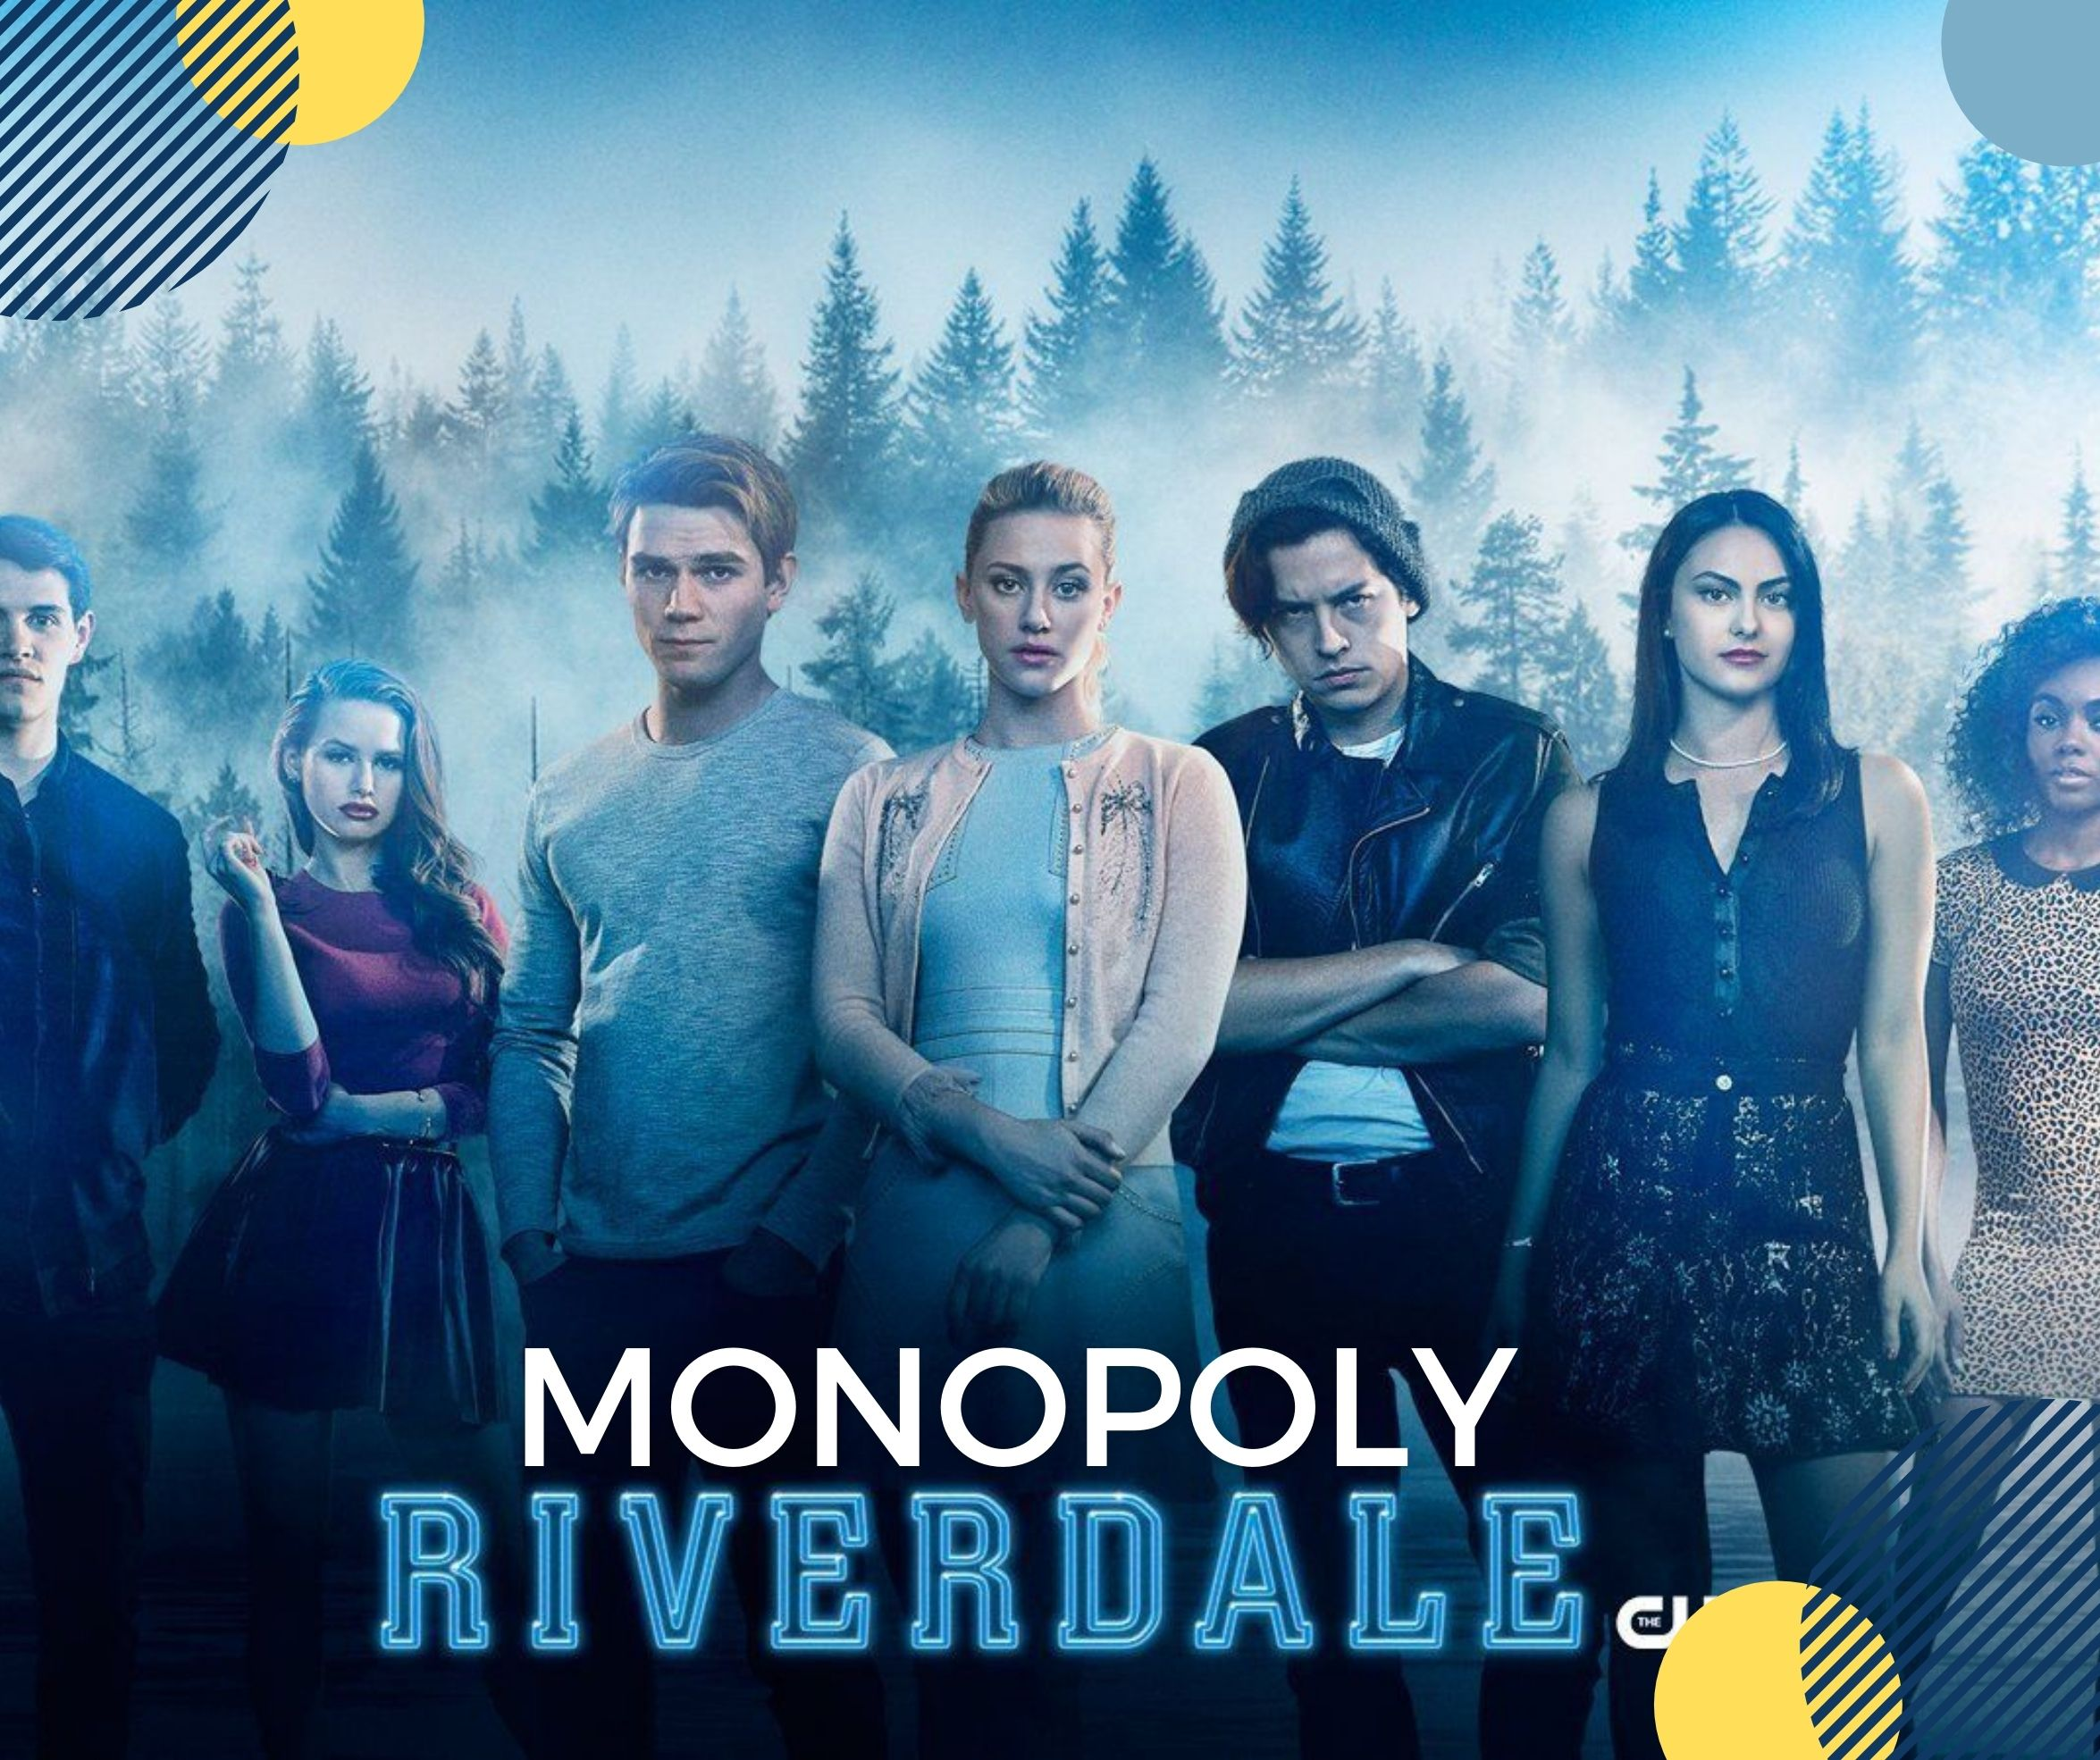 Comprar Monopoly Riverdale en Español